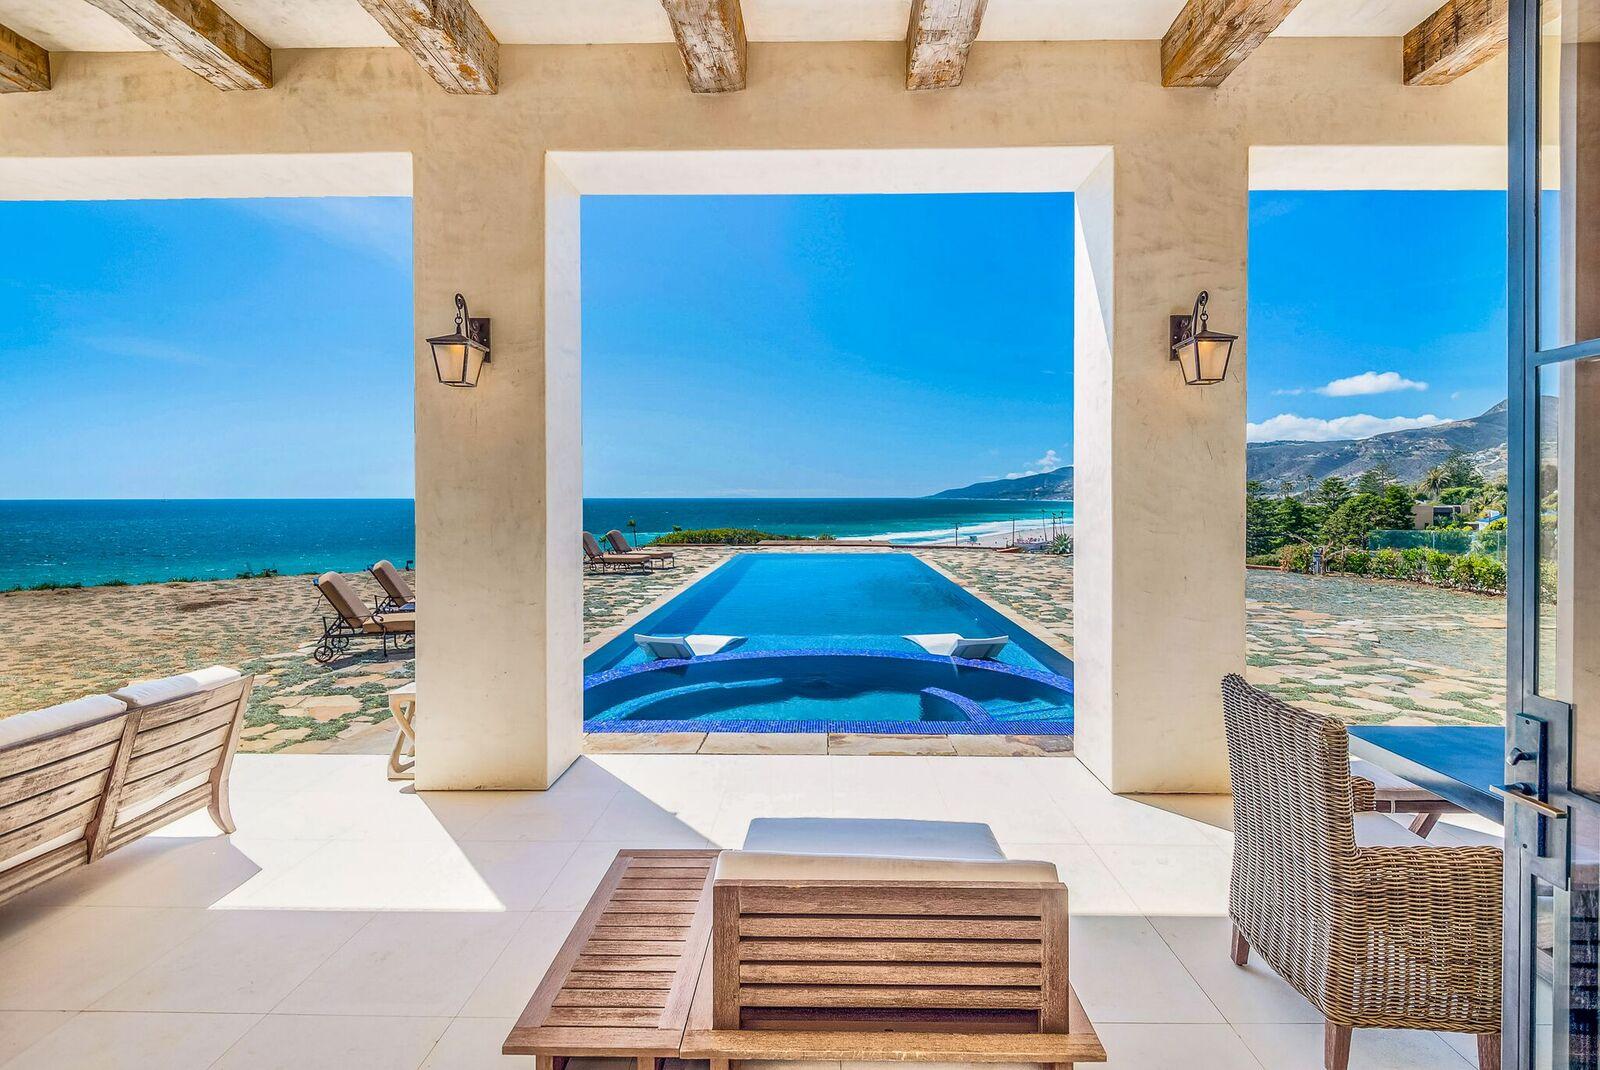 MAL-299 - Malibu Ocean Front Luxury Villa | SeaBreeze Vacation Rentals